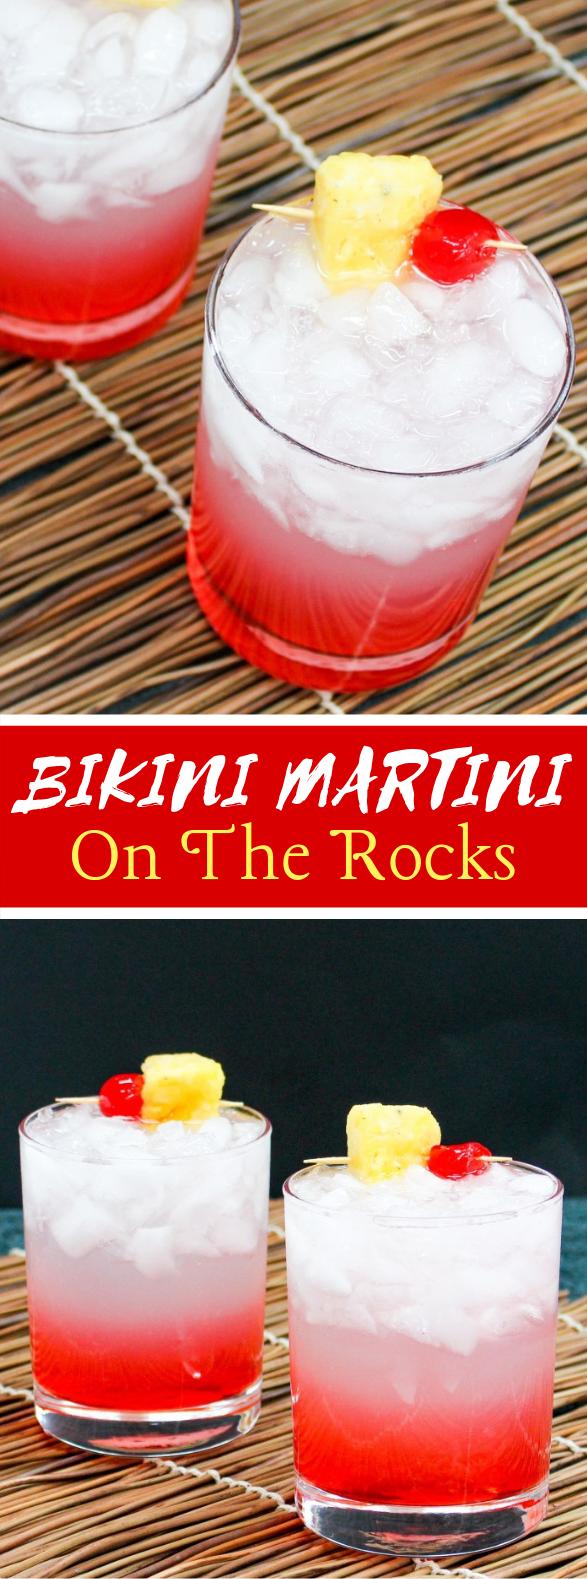 Bikini Martini #vodka #drinks